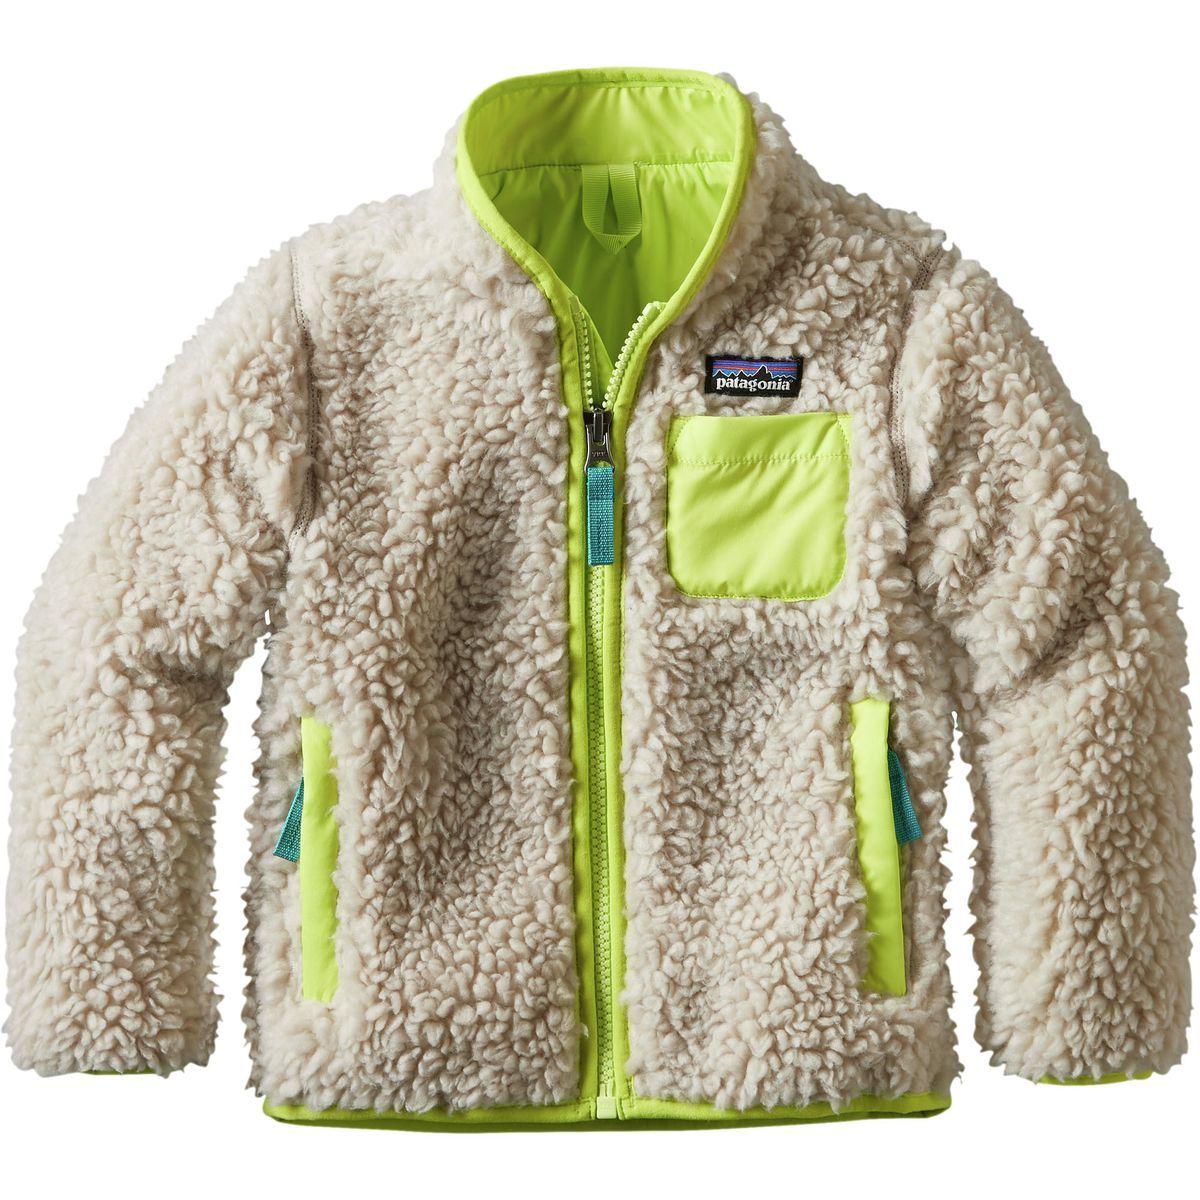 Patagonia Retro X Fleece Jacket Toddler Boys Kids Matttroy